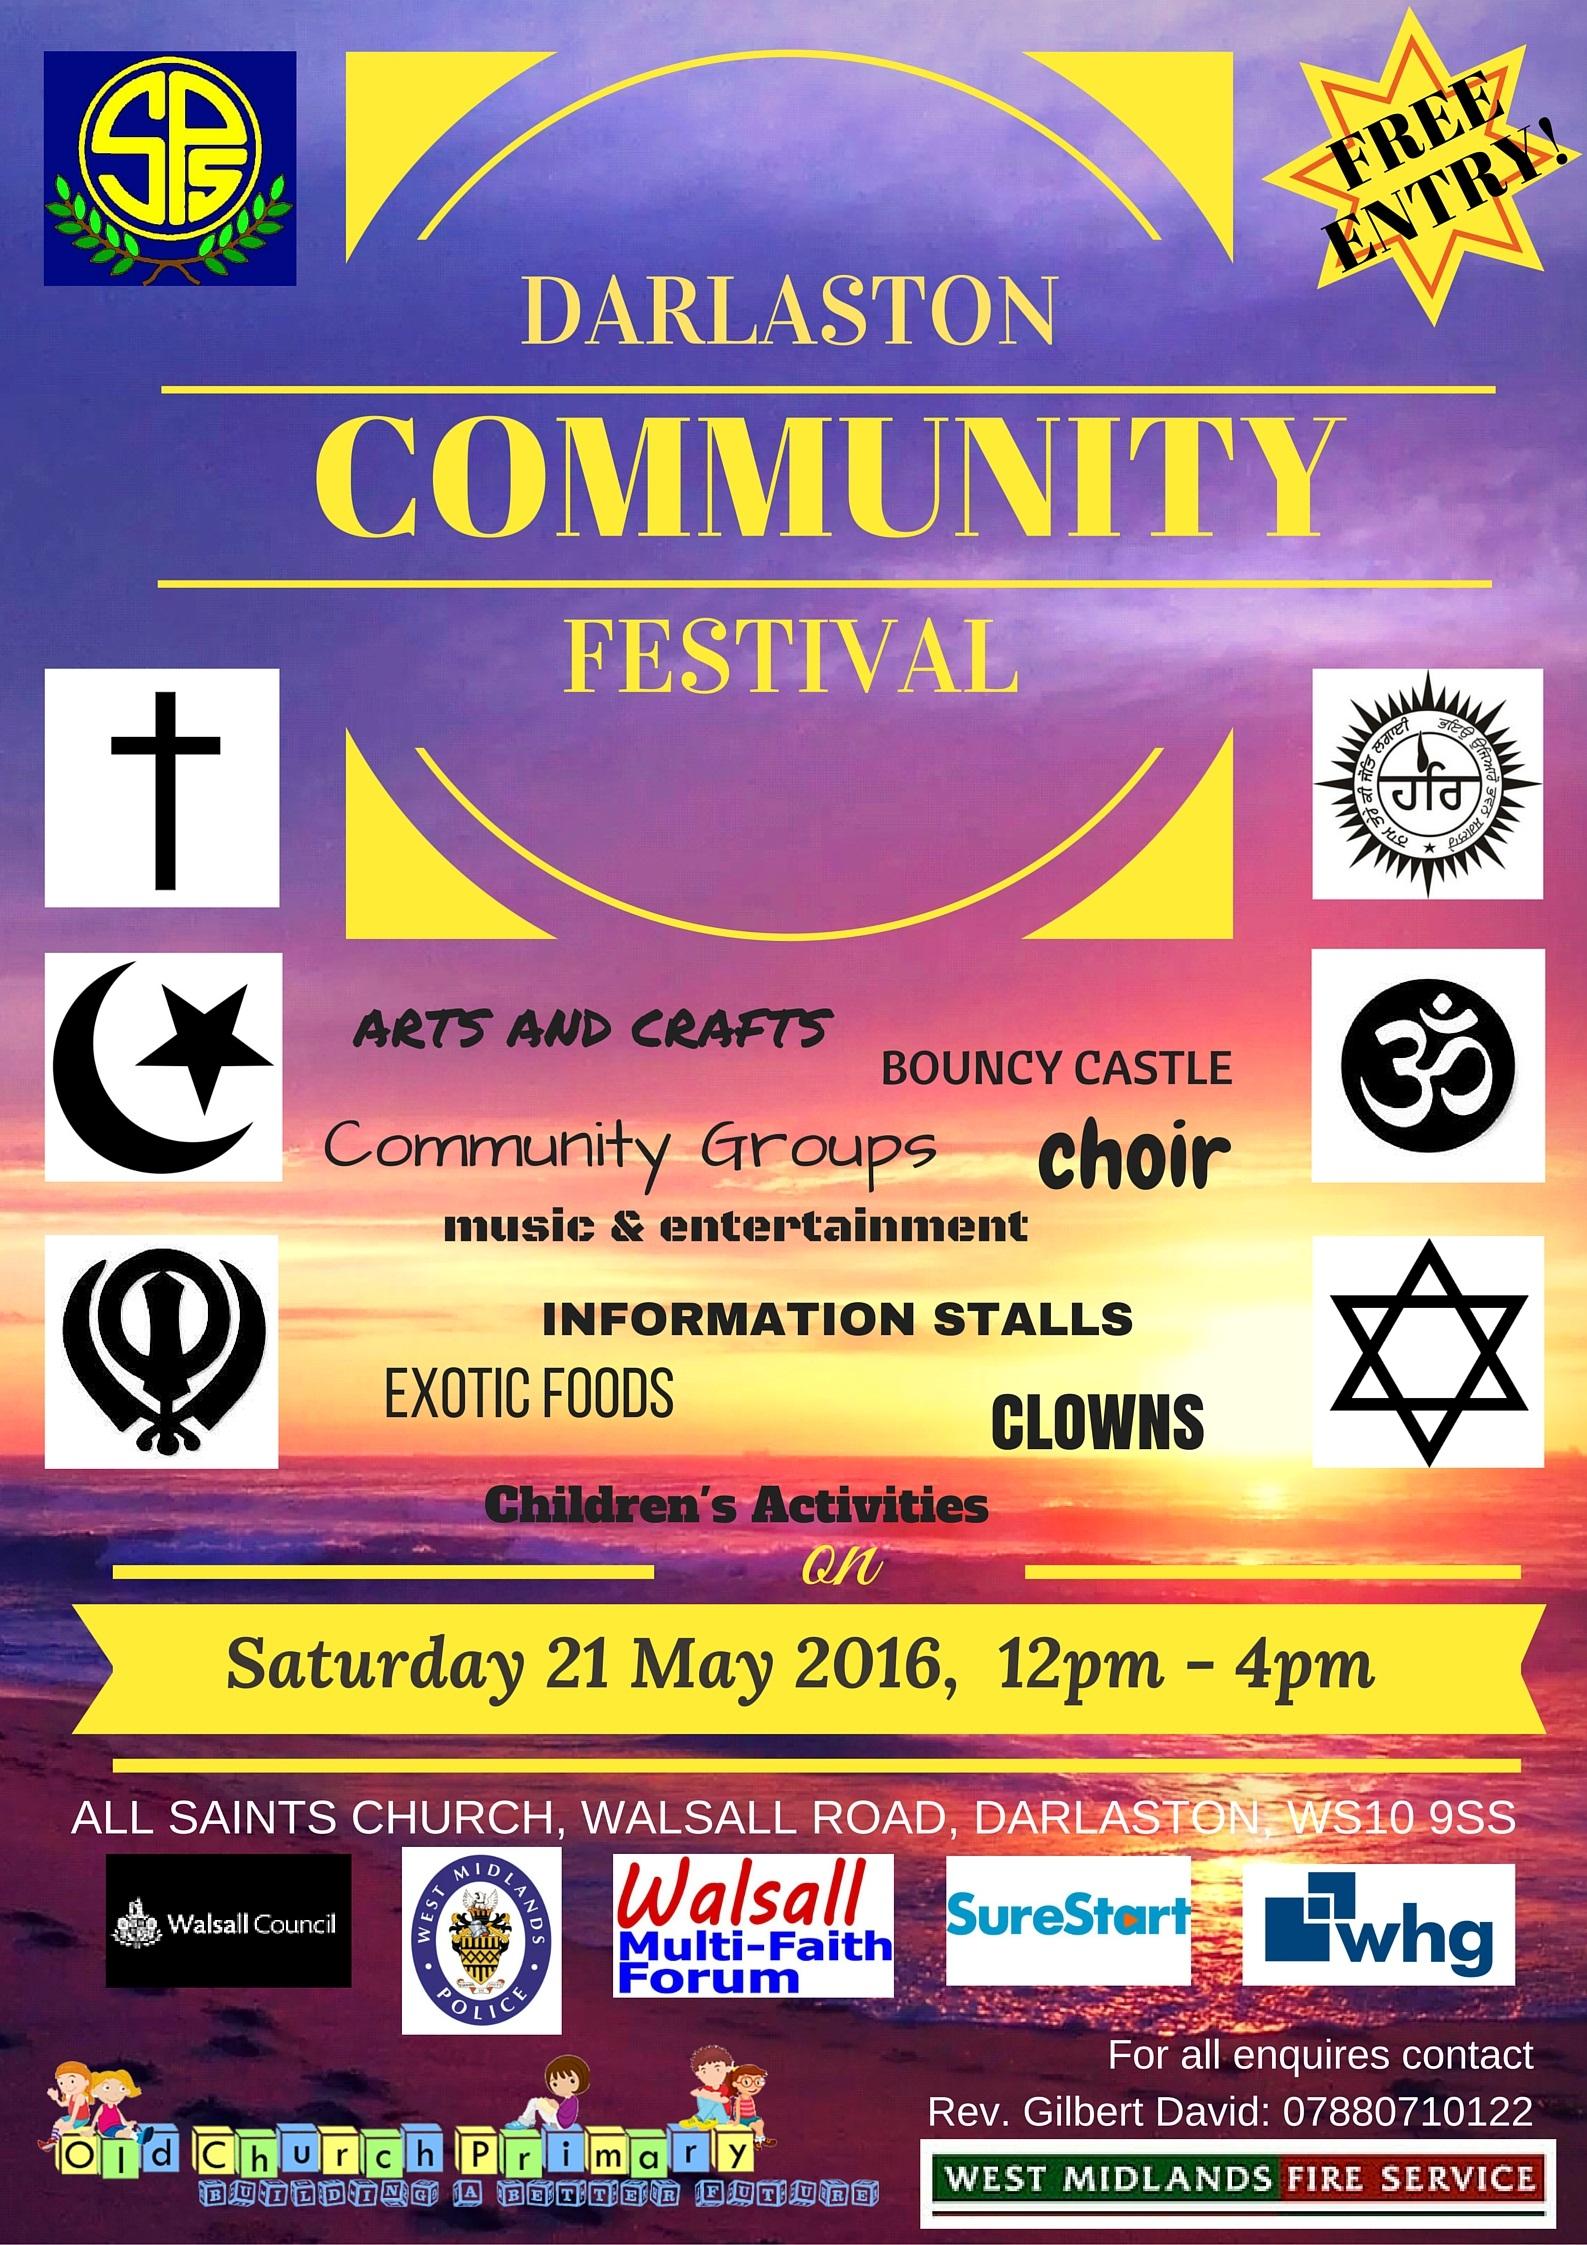 Darlaston Community Festival 2016